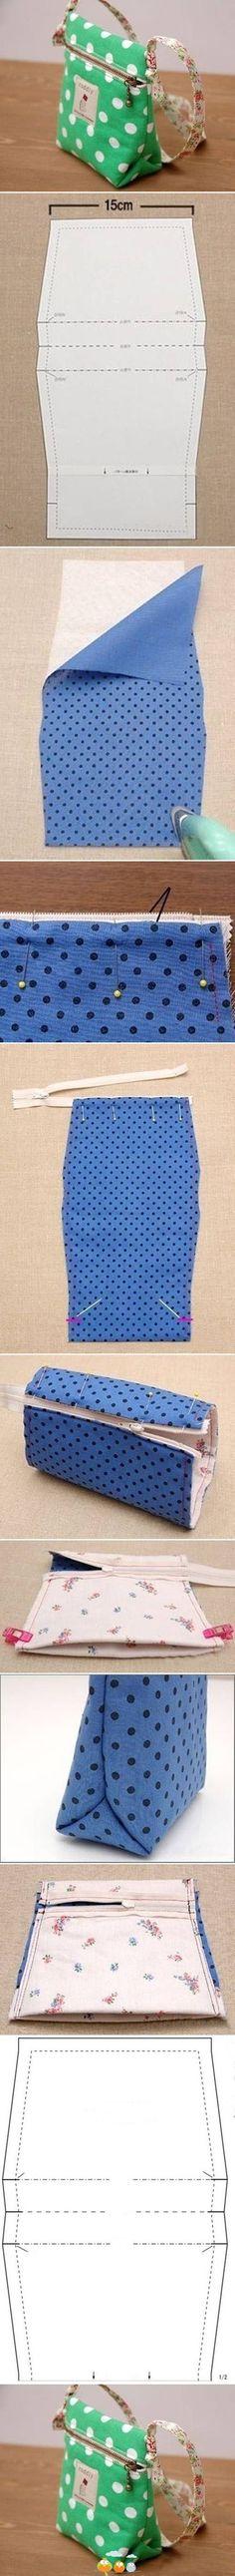 How to Make Stylish Fabric Handmade bags1065